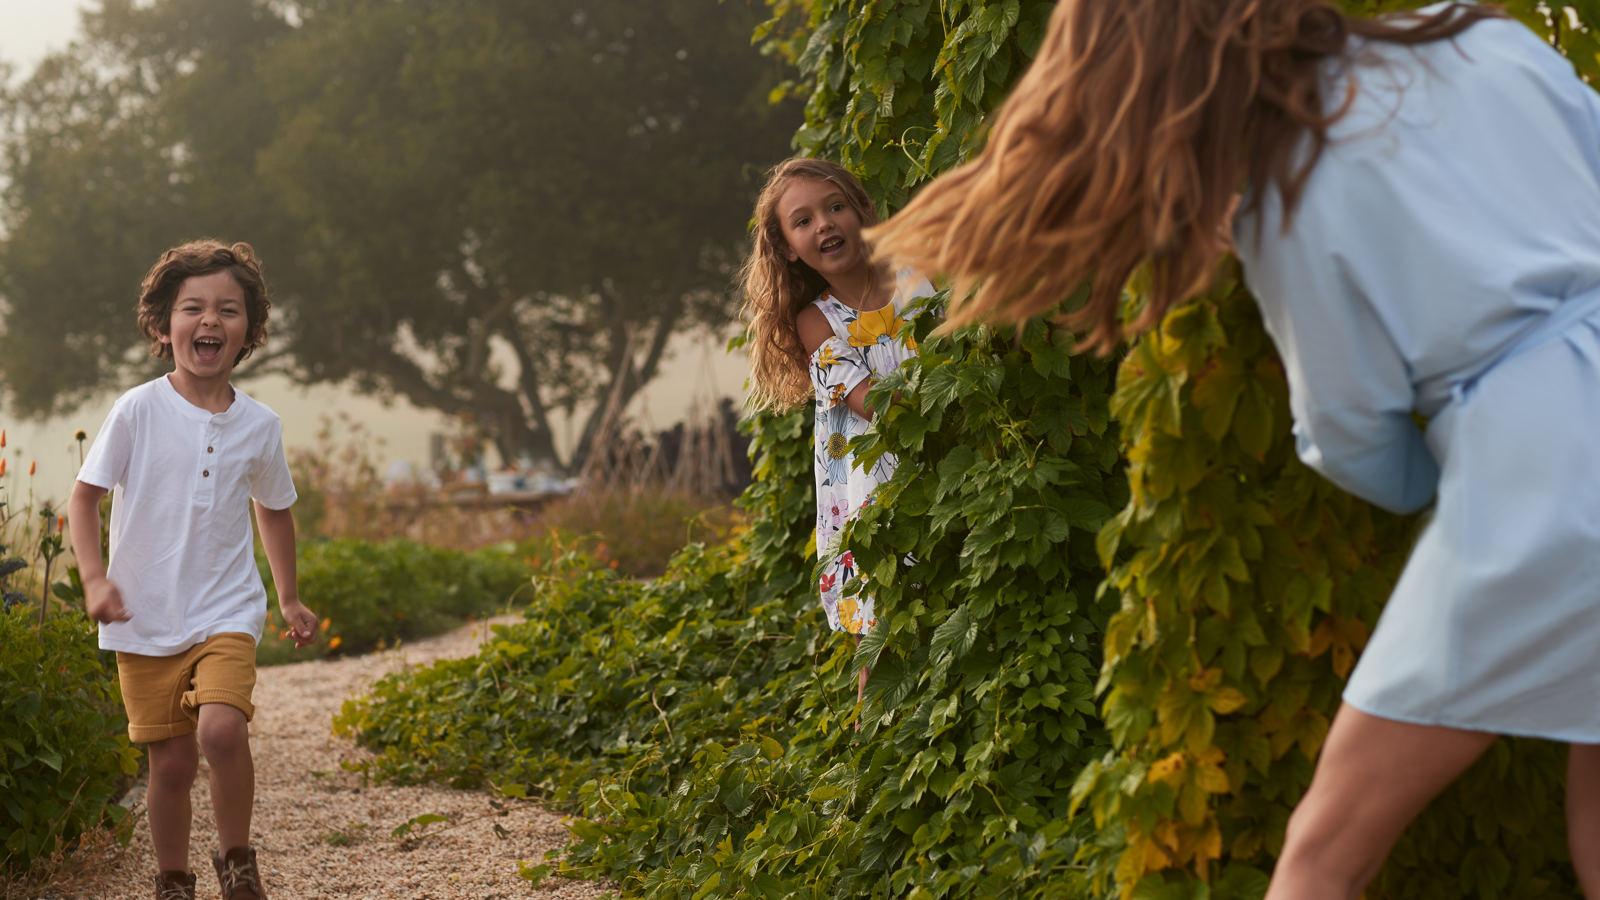 Carmel Valley Ranch_Lifestyle_Organic Garden_Peekaboo_GJ_0180_v1_current